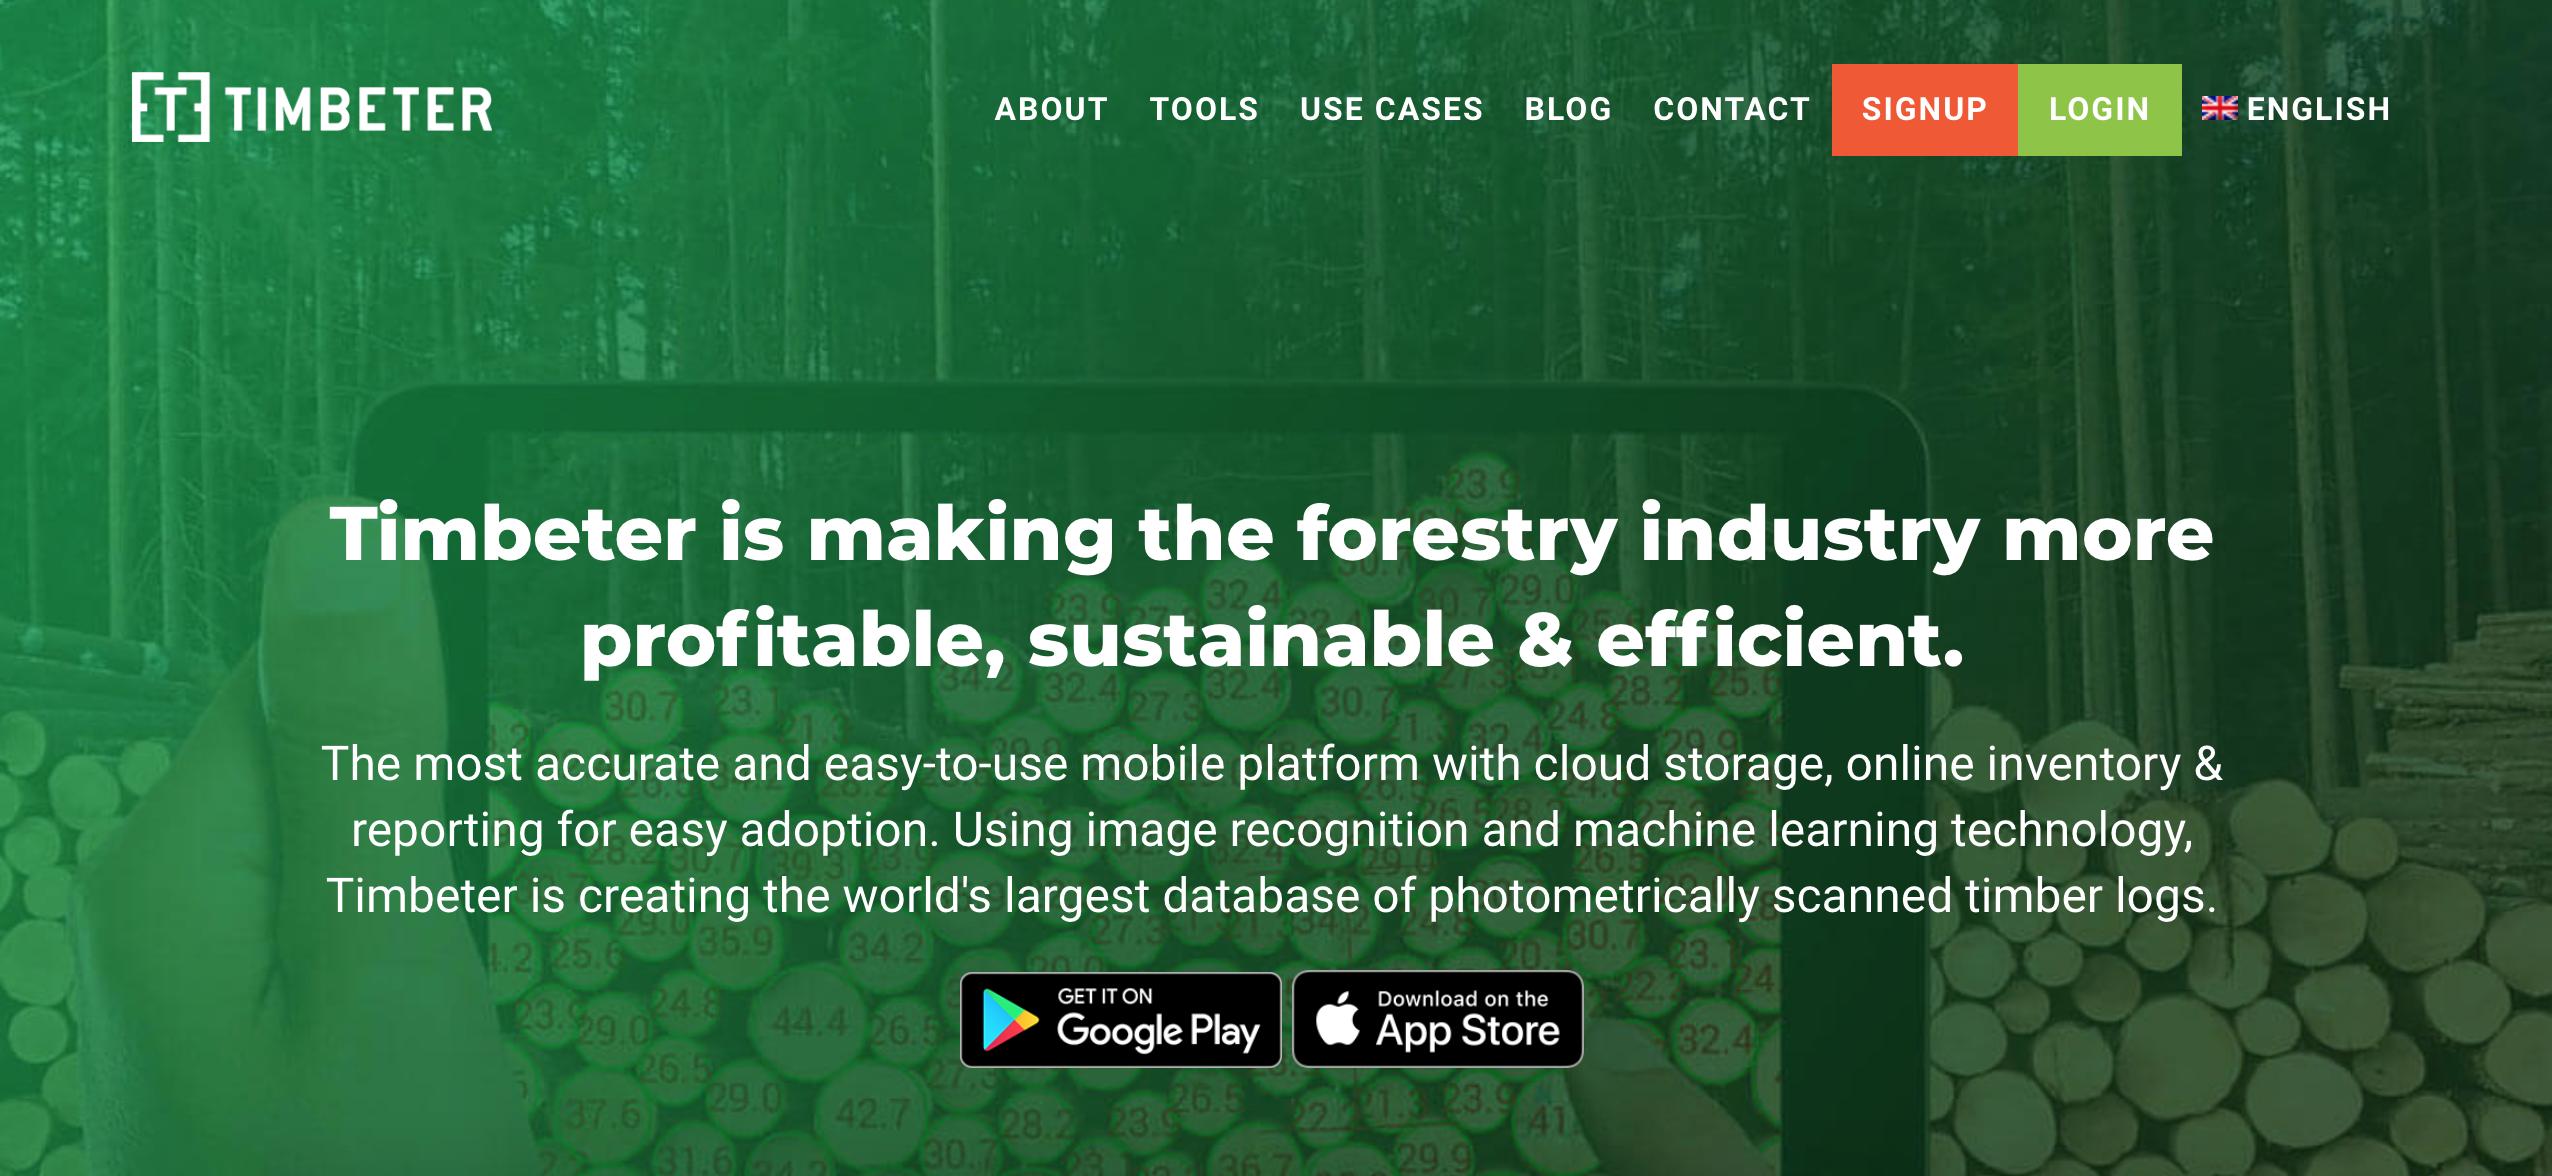 Timbeter New Website